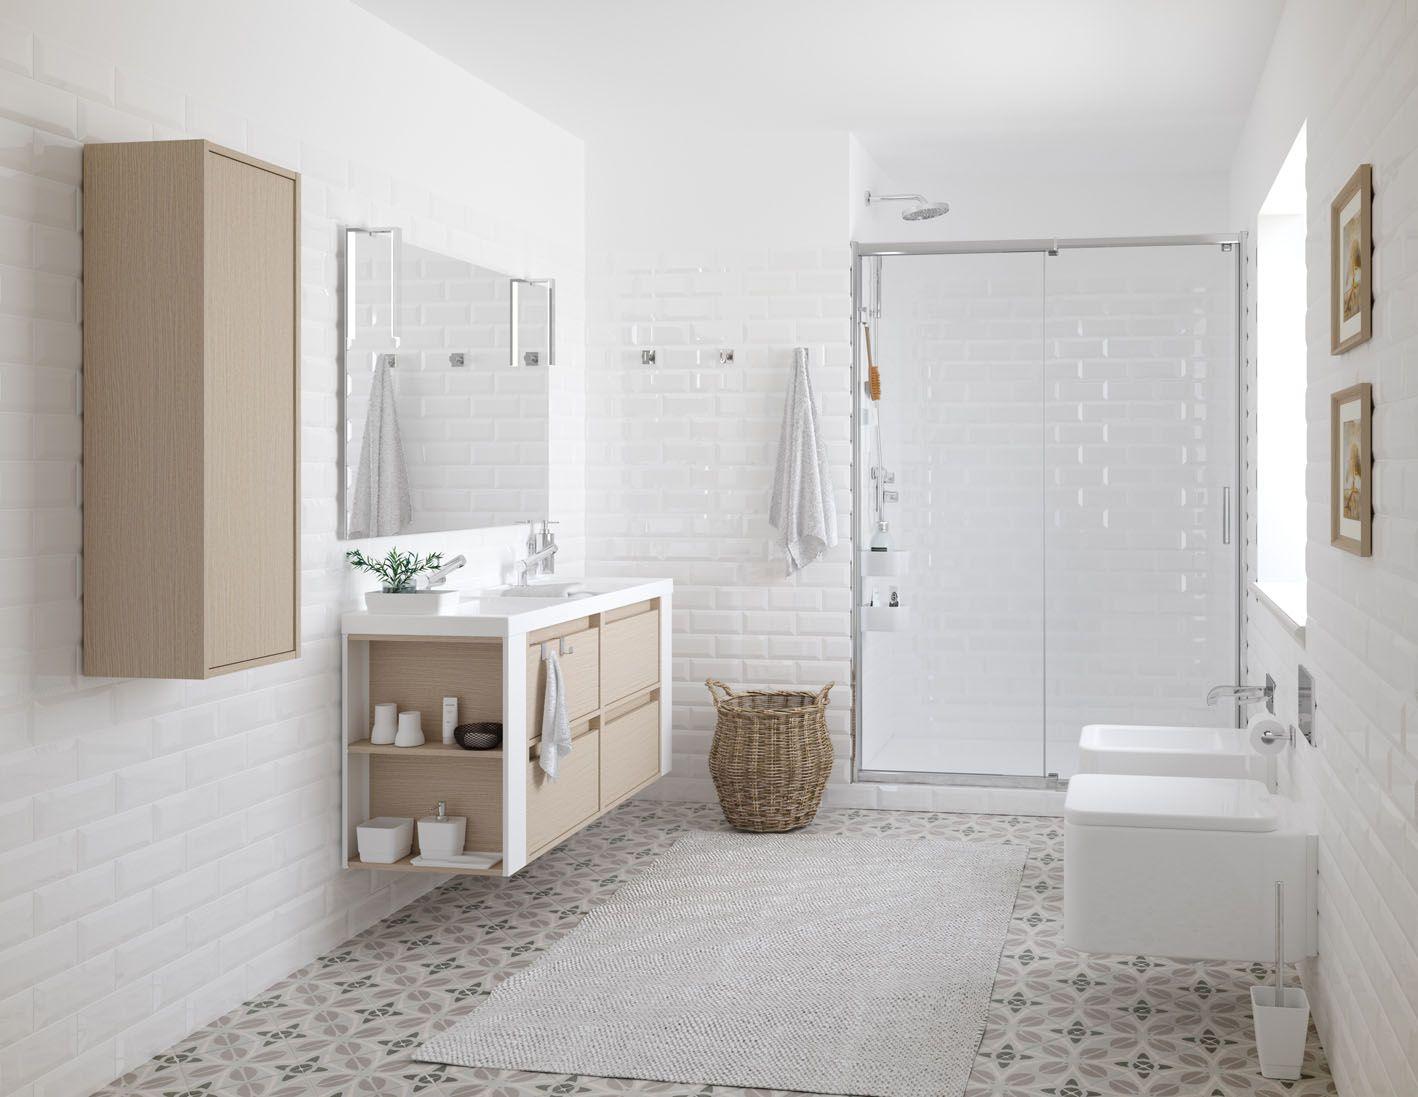 BATH+ B-Smart mueble y armario | ideas for home | Pinterest